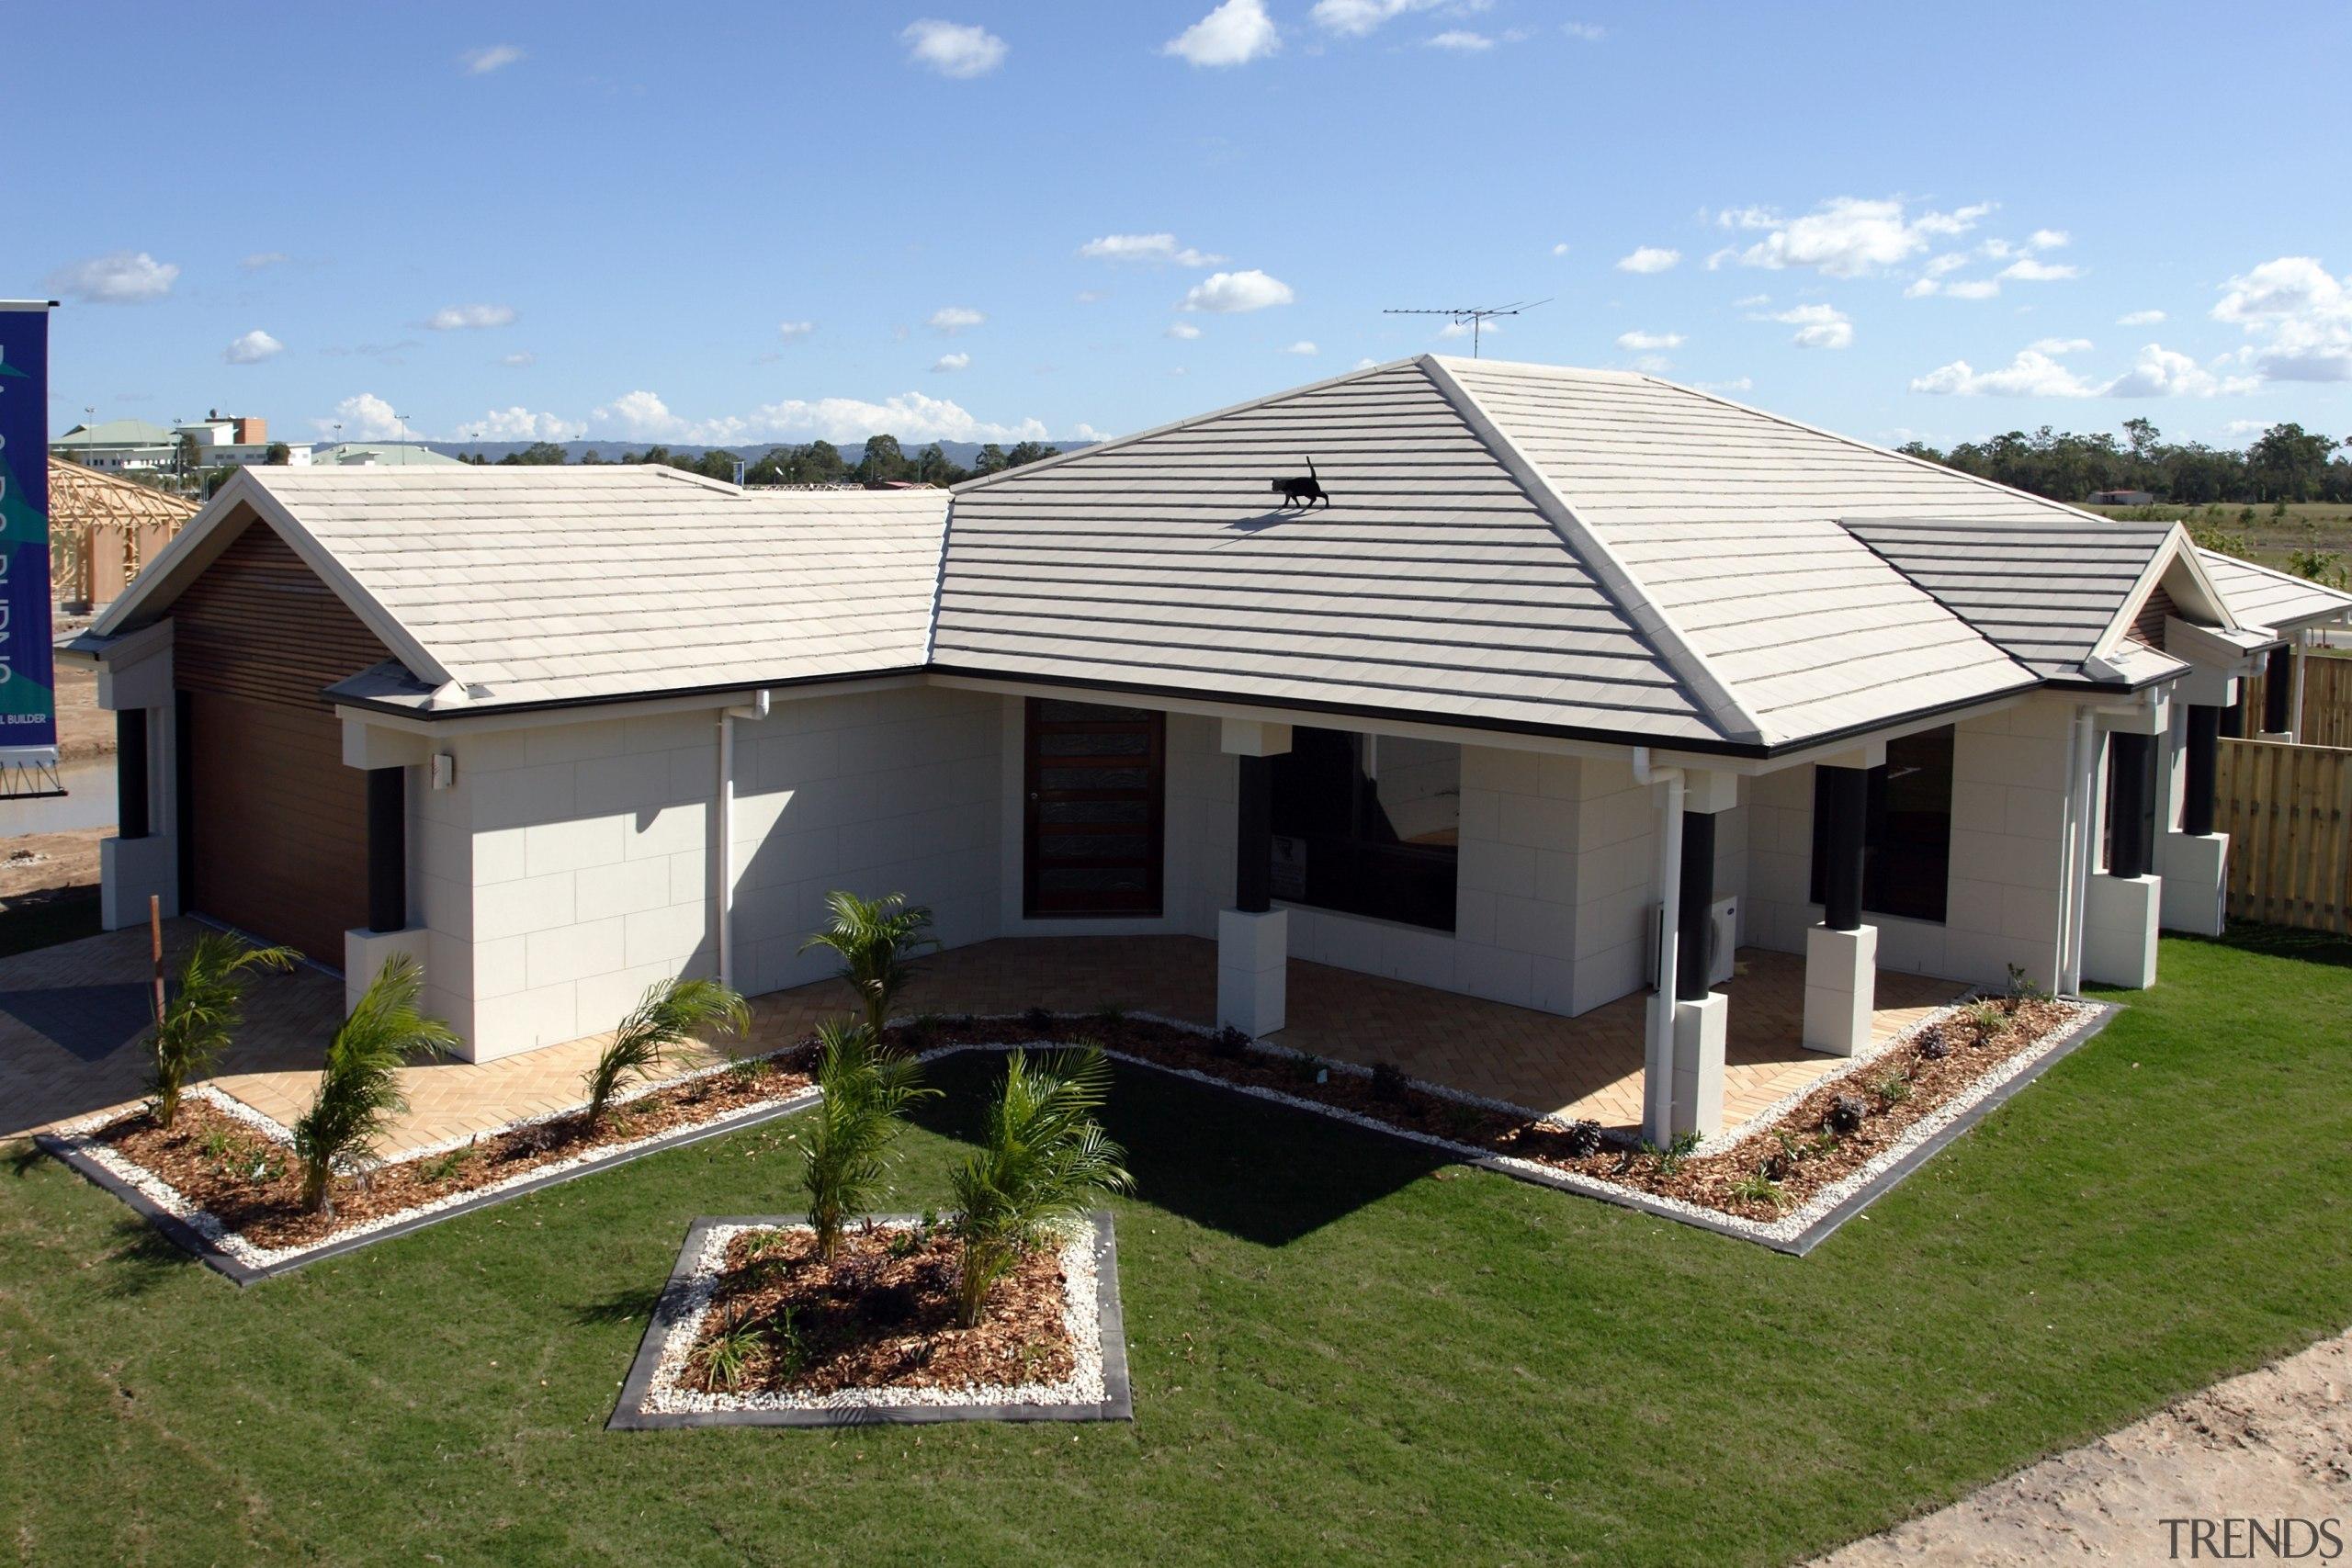 Monier Concrete Tiles - Horizon - Monier Concrete cottage, elevation, estate, facade, home, house, outdoor structure, property, real estate, residential area, roof, siding, yard, teal, brown